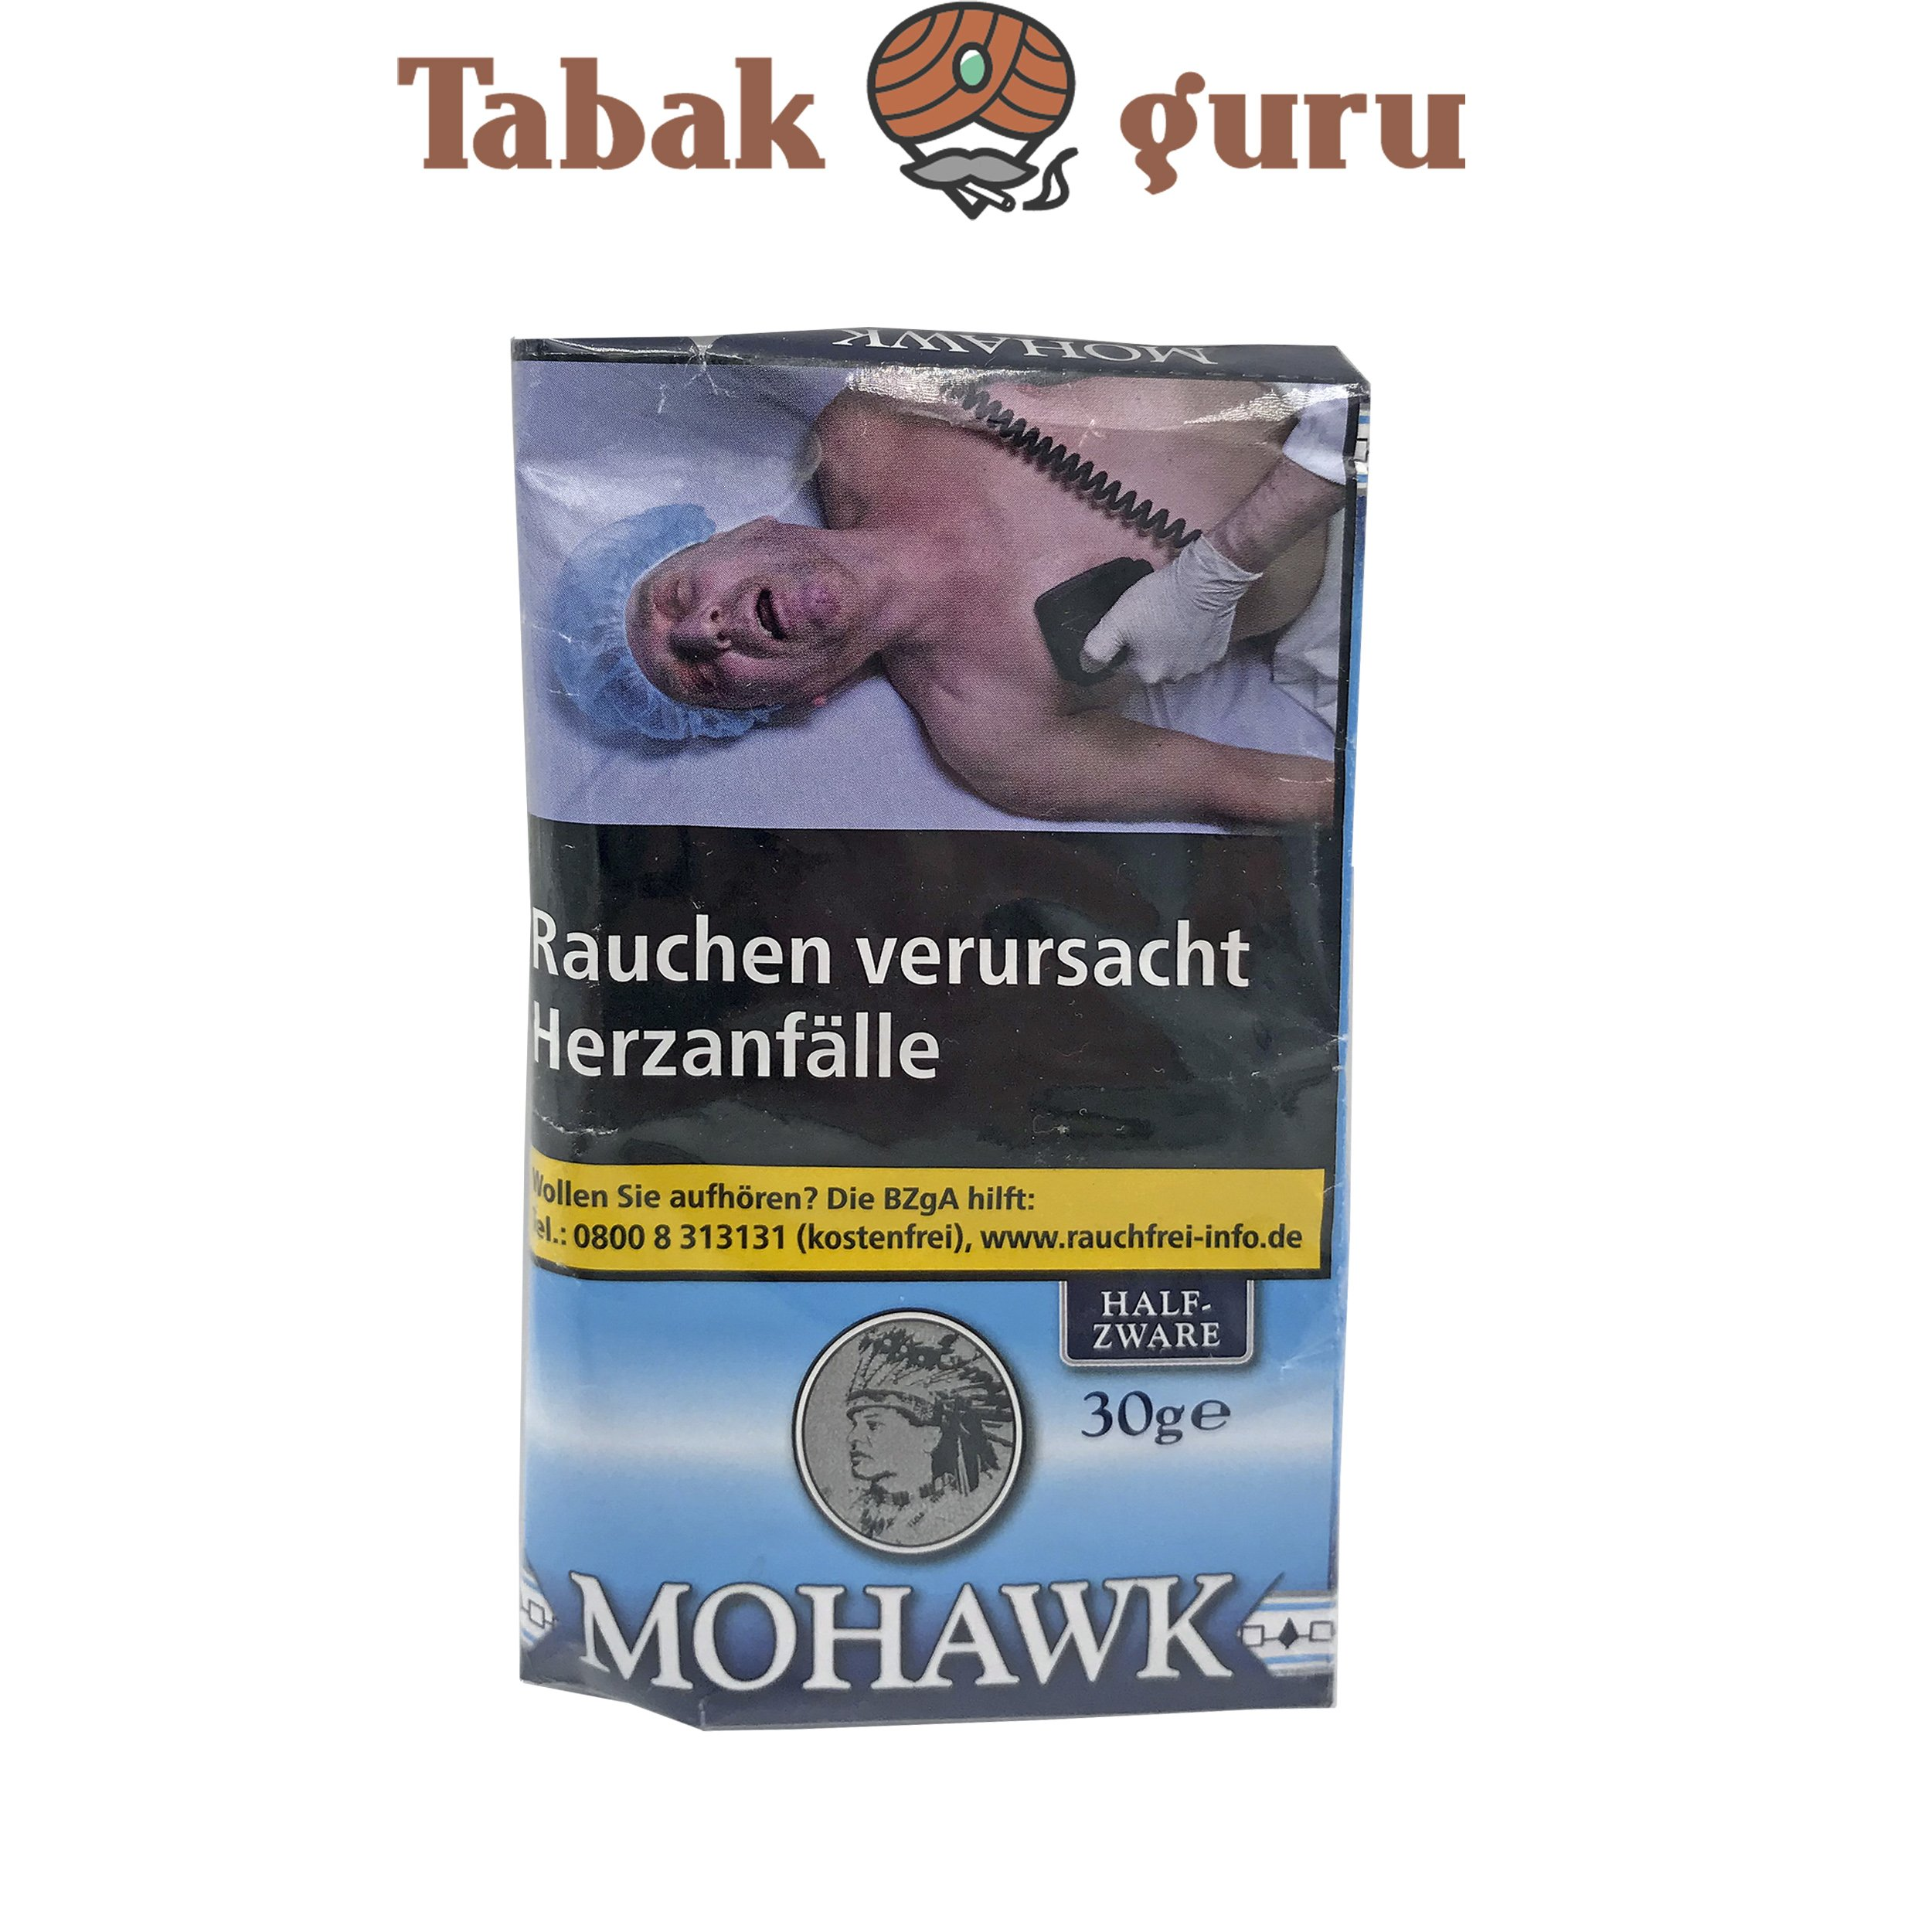 Mohawk Half Zware 30g Drehtabak Zigarettentabak